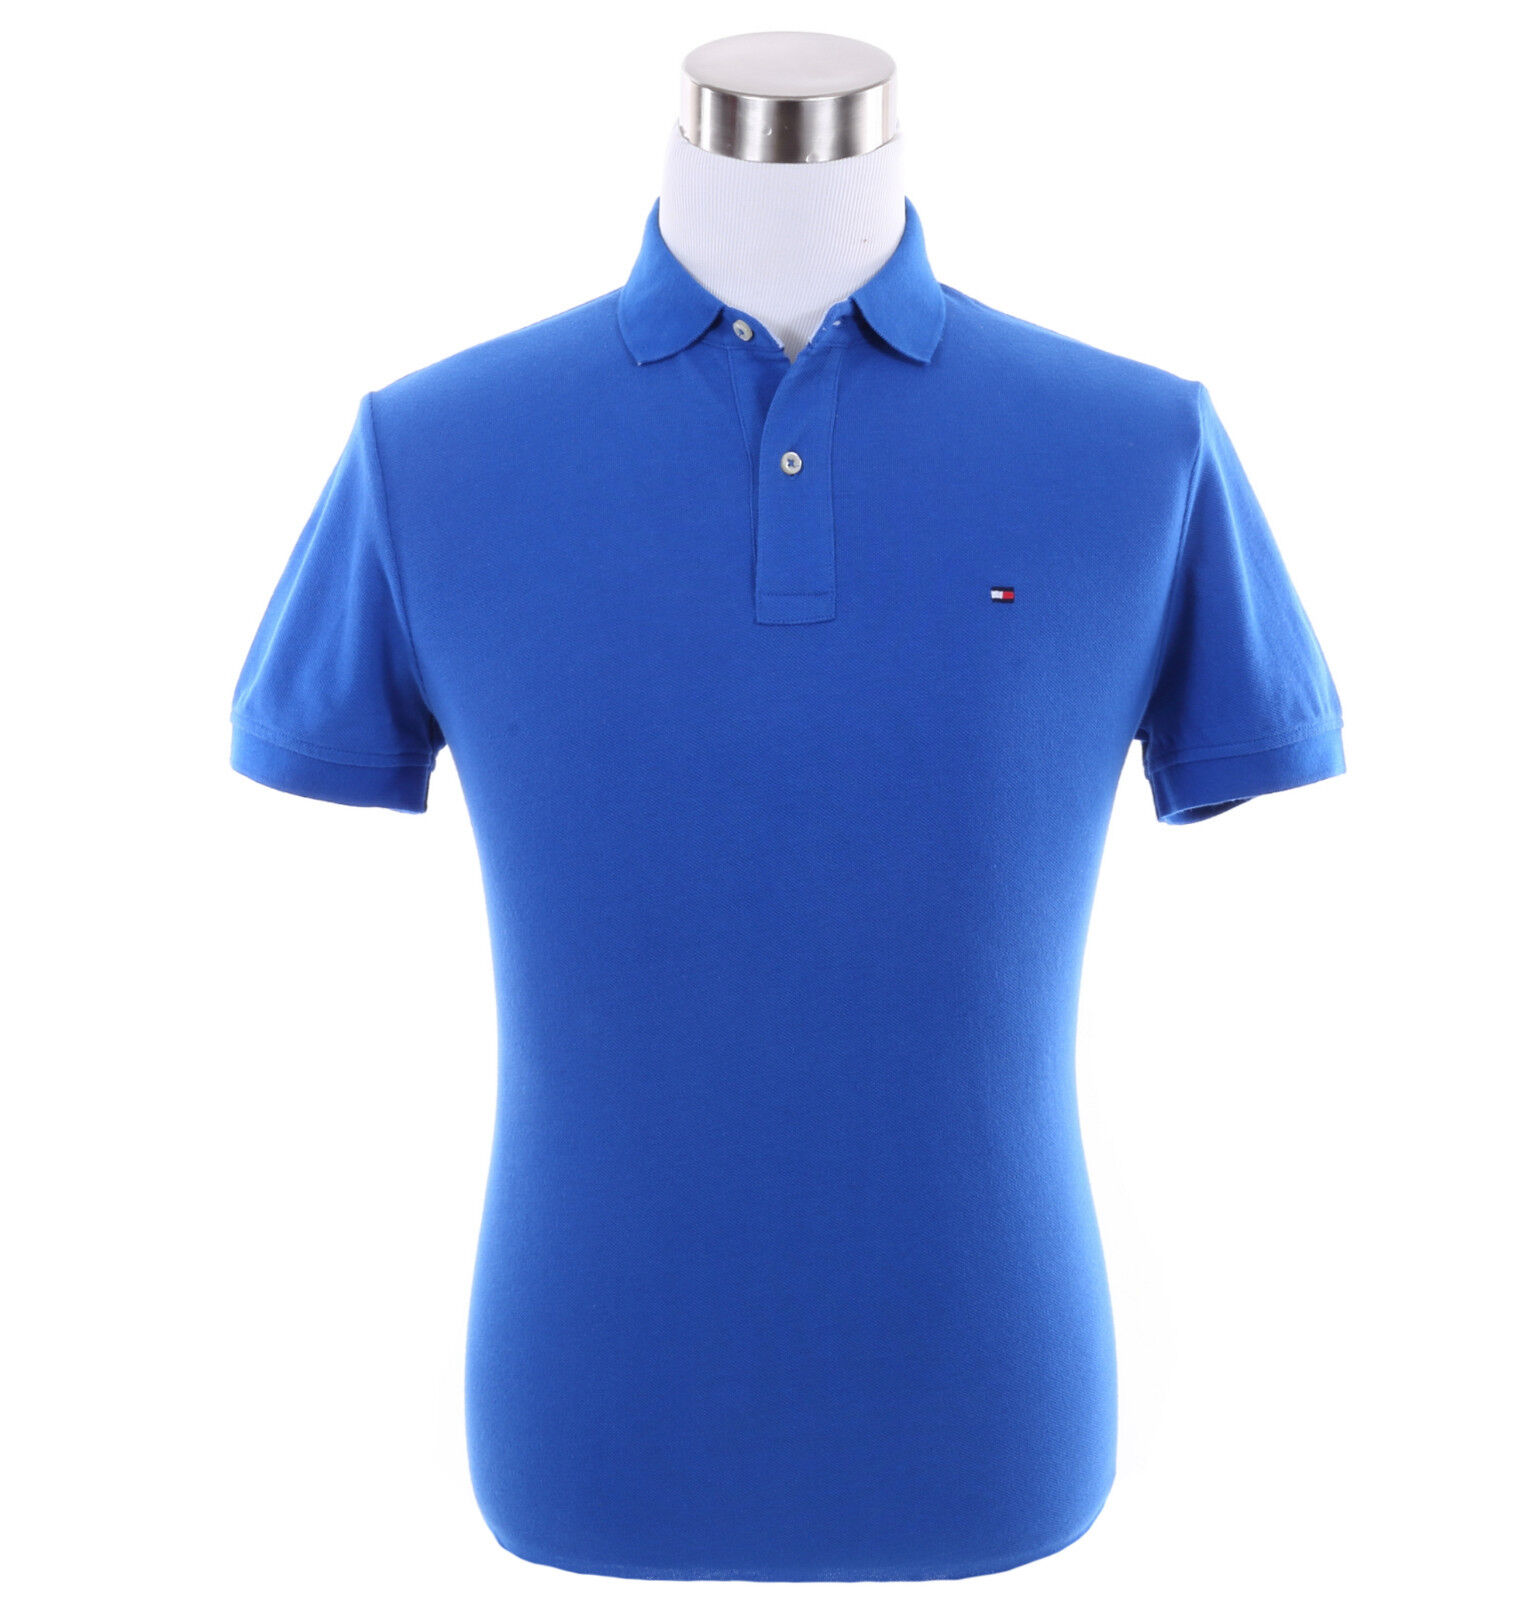 Tommy Hilfiger Mens Shirts Short Sleeve Sears